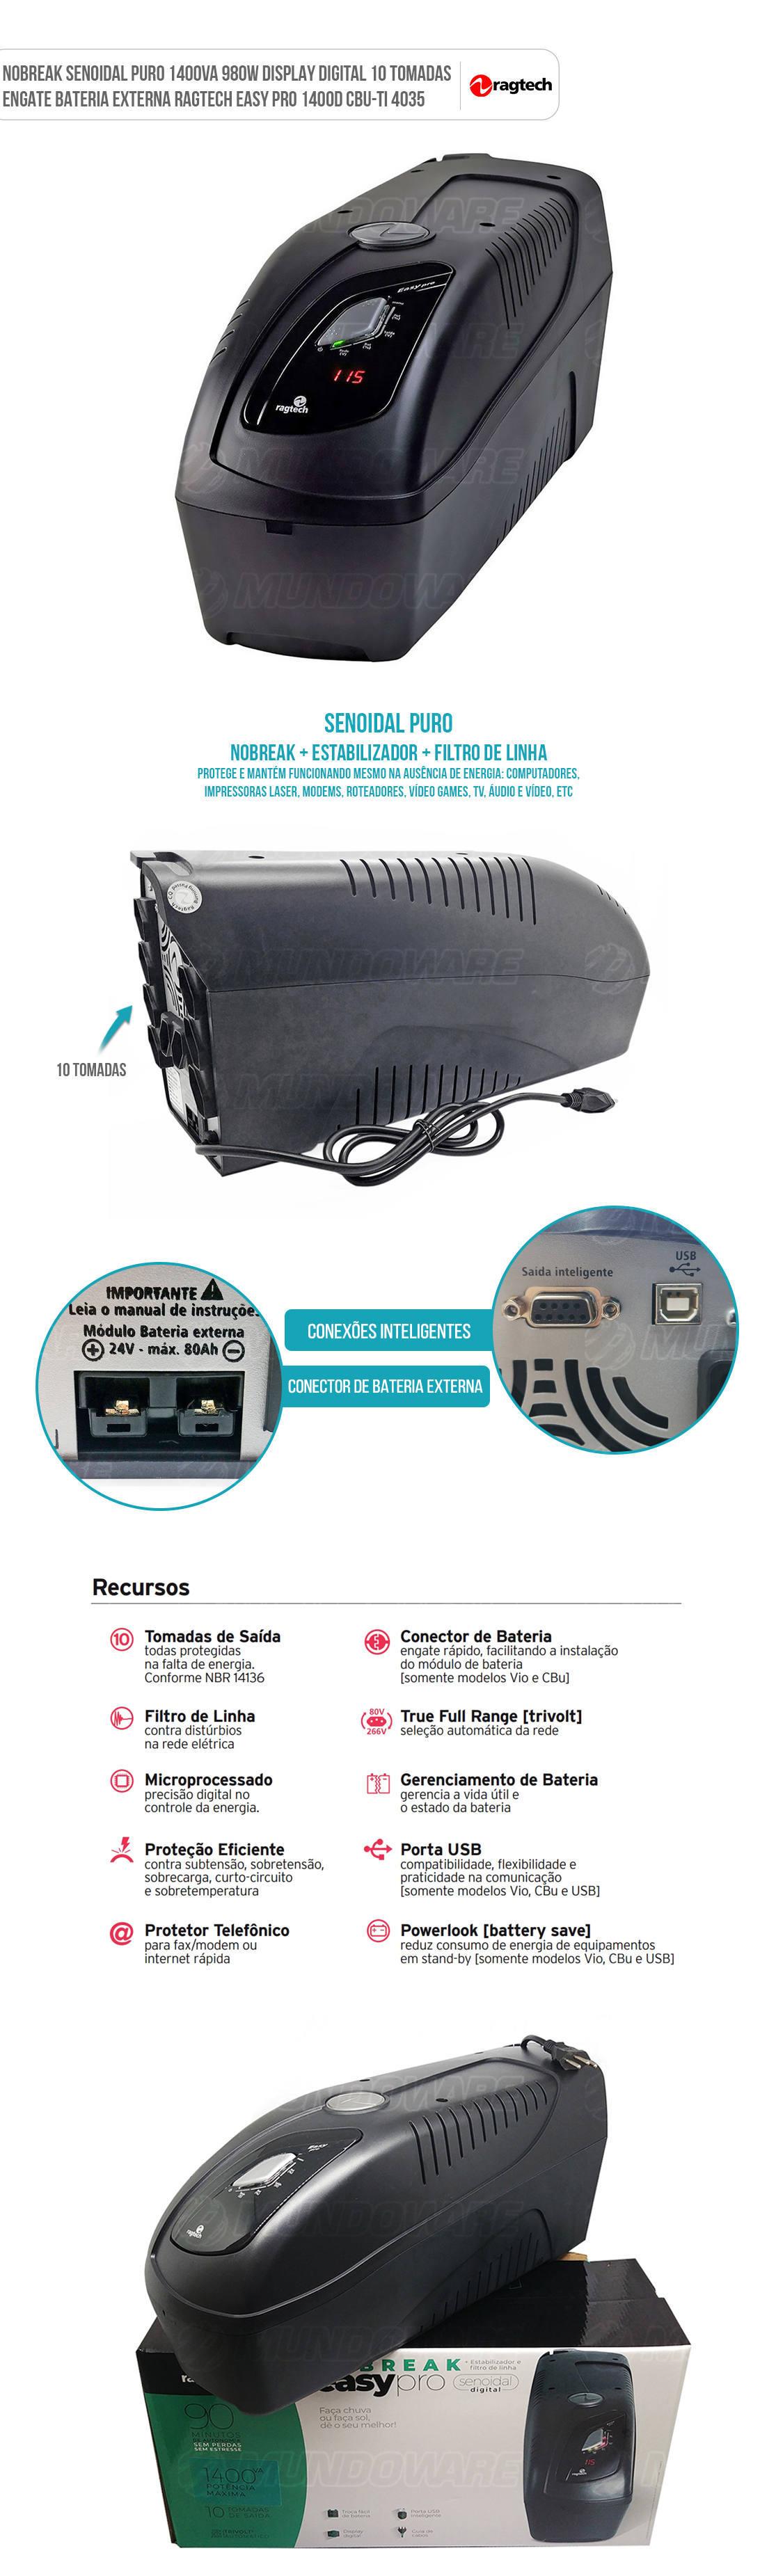 Nobreak 1400VA Senoidal Puro 10 Tomadas Trivolt EasyPro + Engate para Bateria Externa